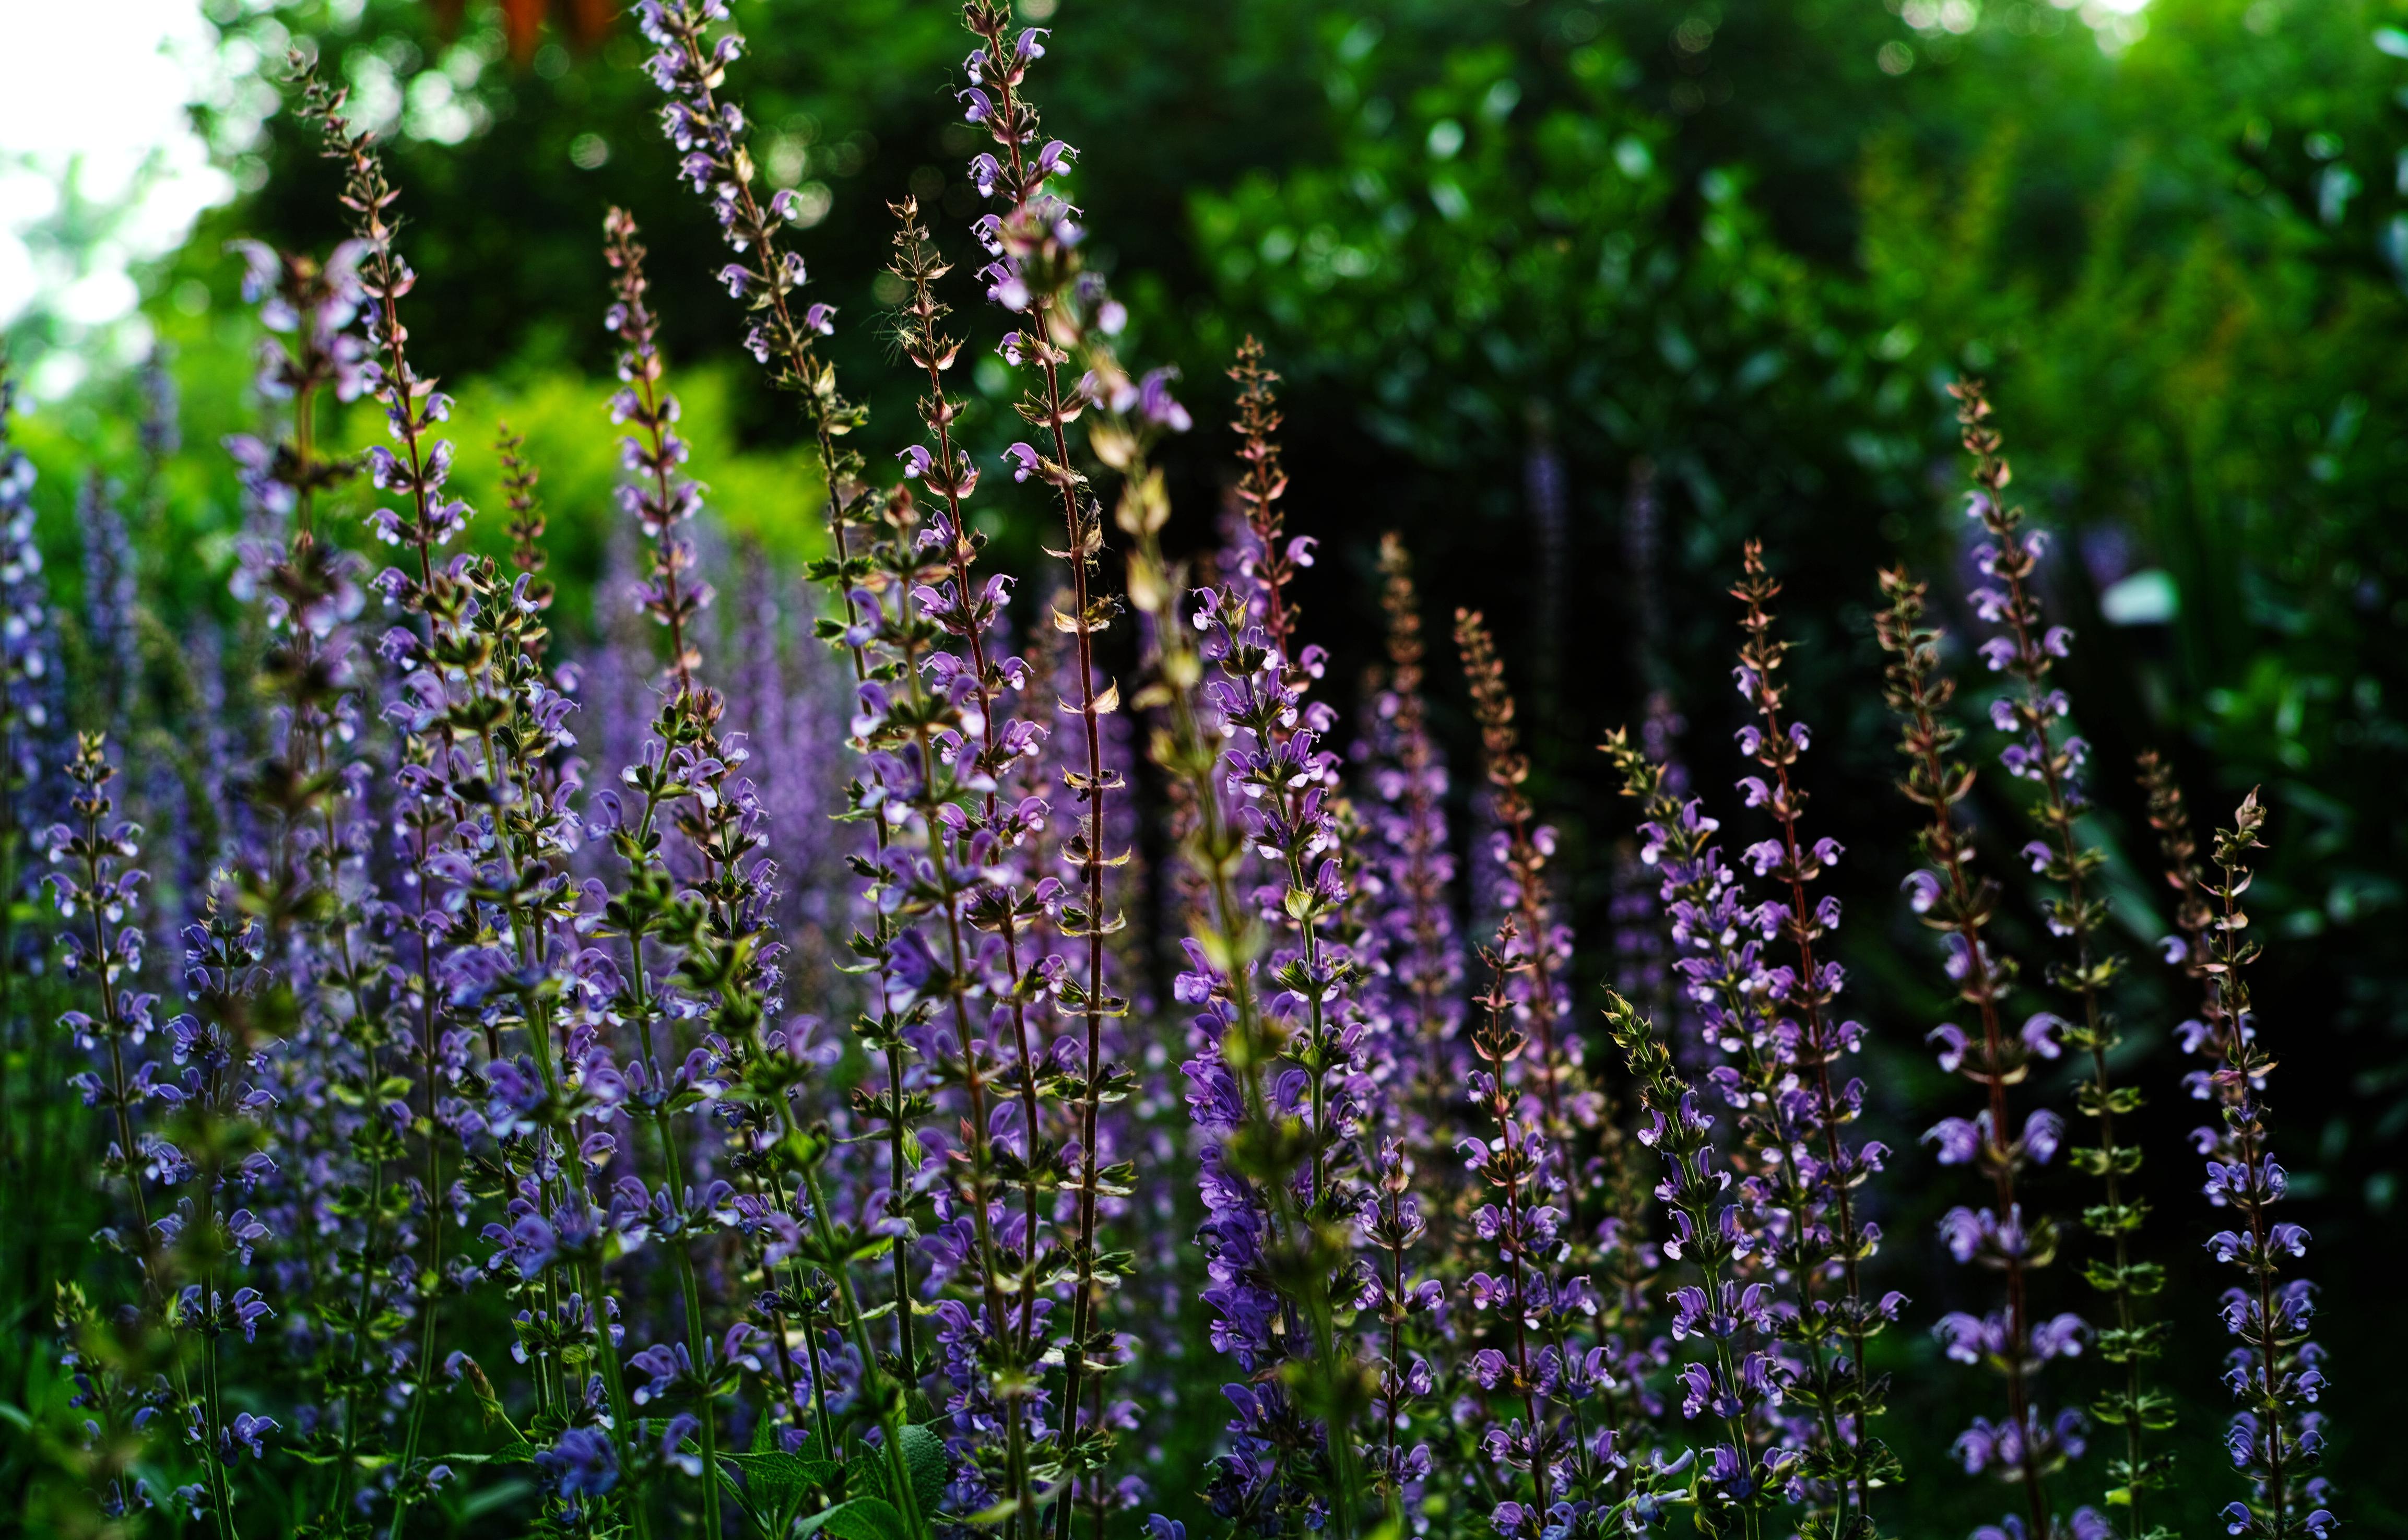 Beautiful Wallpaper Aesthetic Purple - flowers-purple-lavender-flower-plant-aesthetic-flora-wildflower-botany-land-plant-flowering-plant-shrub-lupin-english-lavender-405722  2018_203141      .jpg